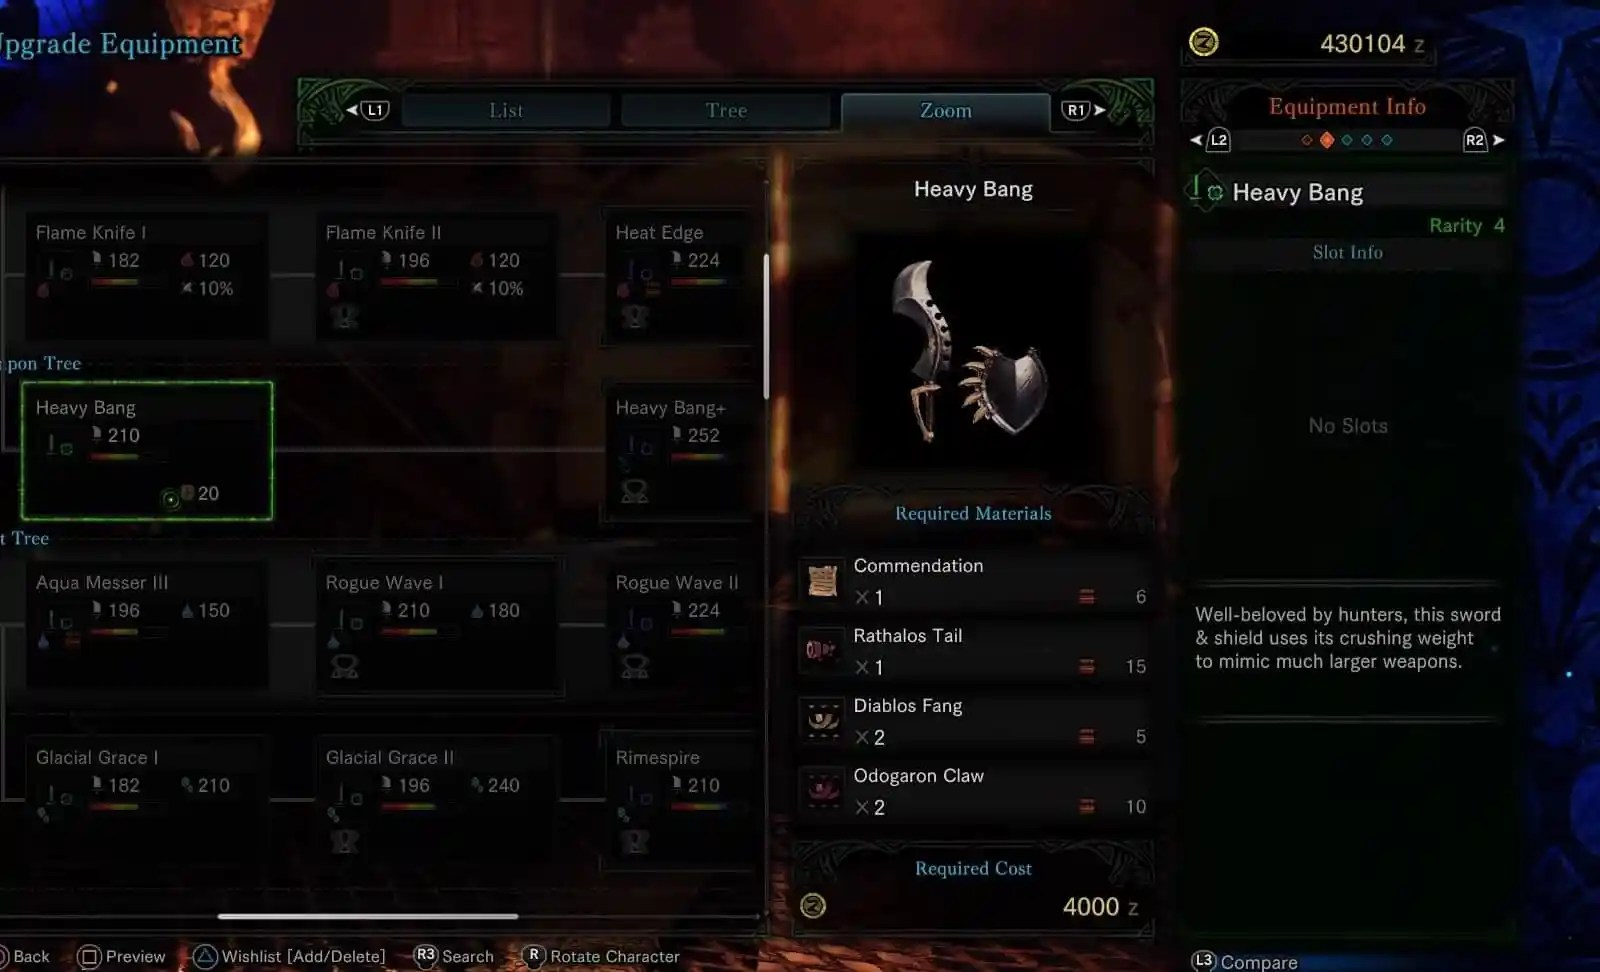 MHW Sword & Shield - Heavy Bang +